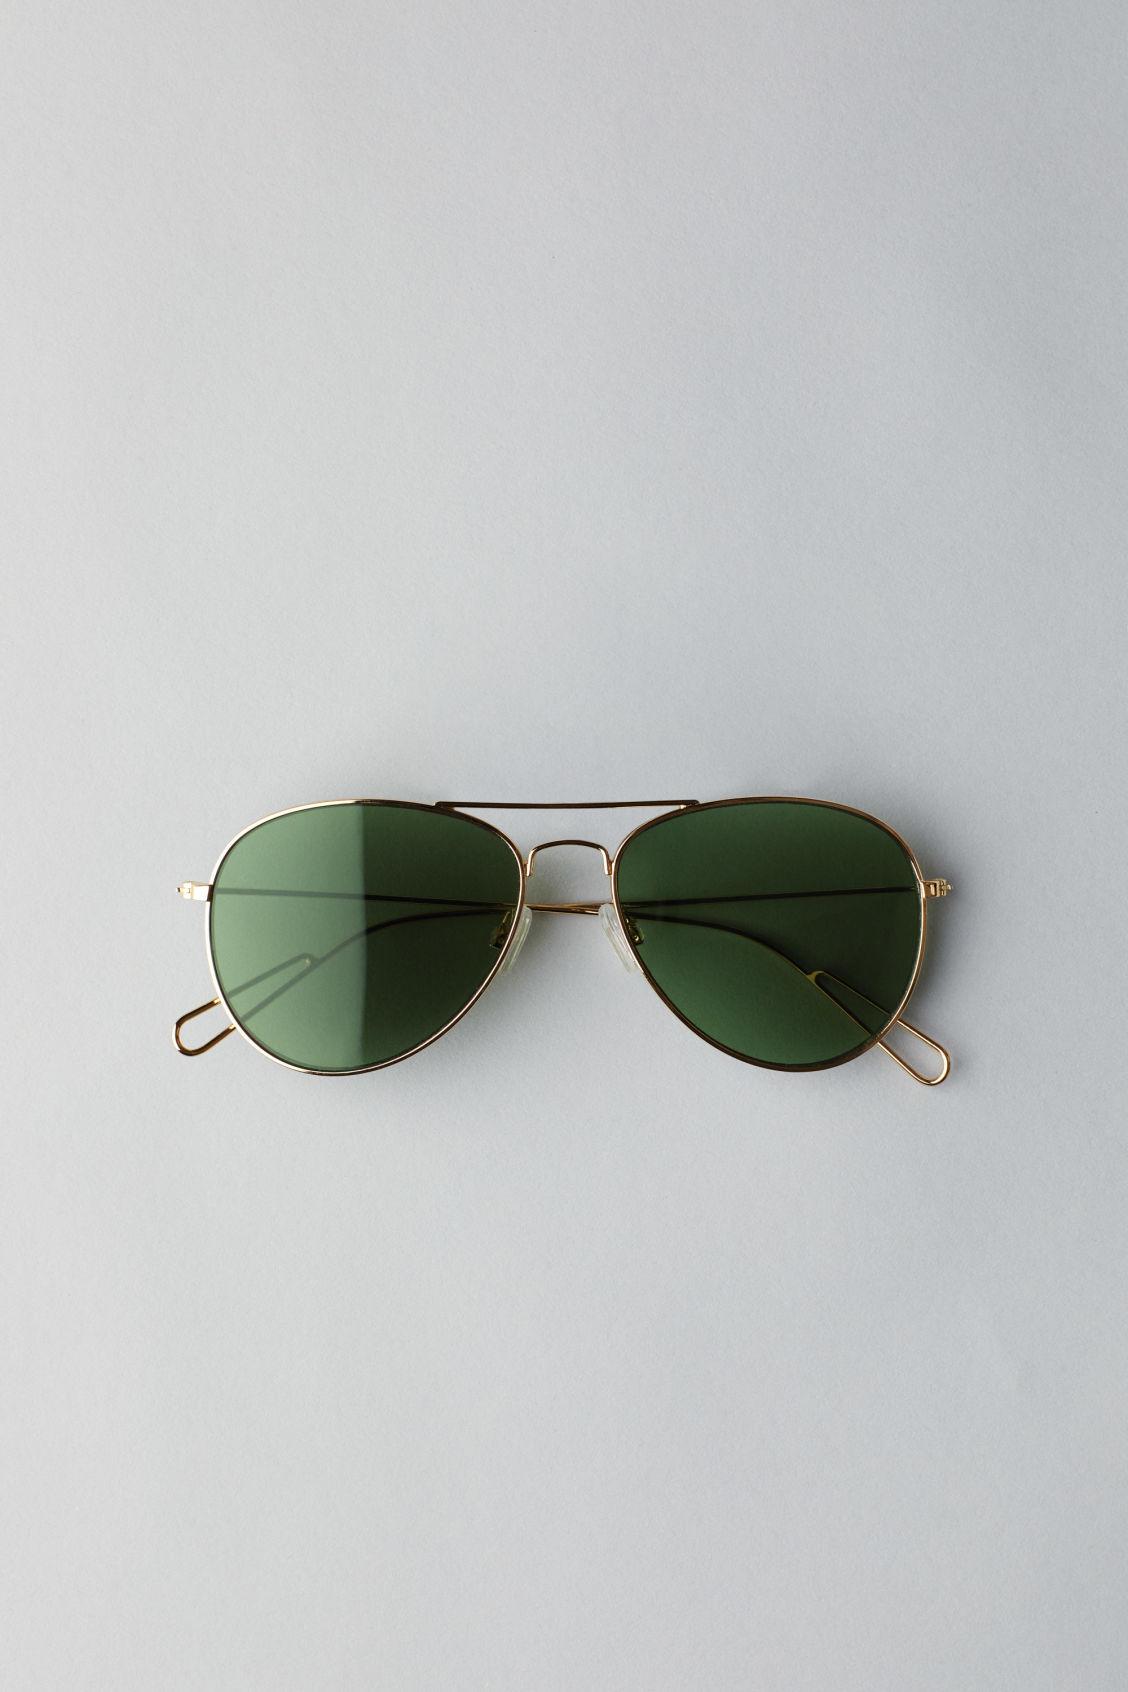 Weekday Tour Aviator Sunglasses - Black r0PWJoMLly